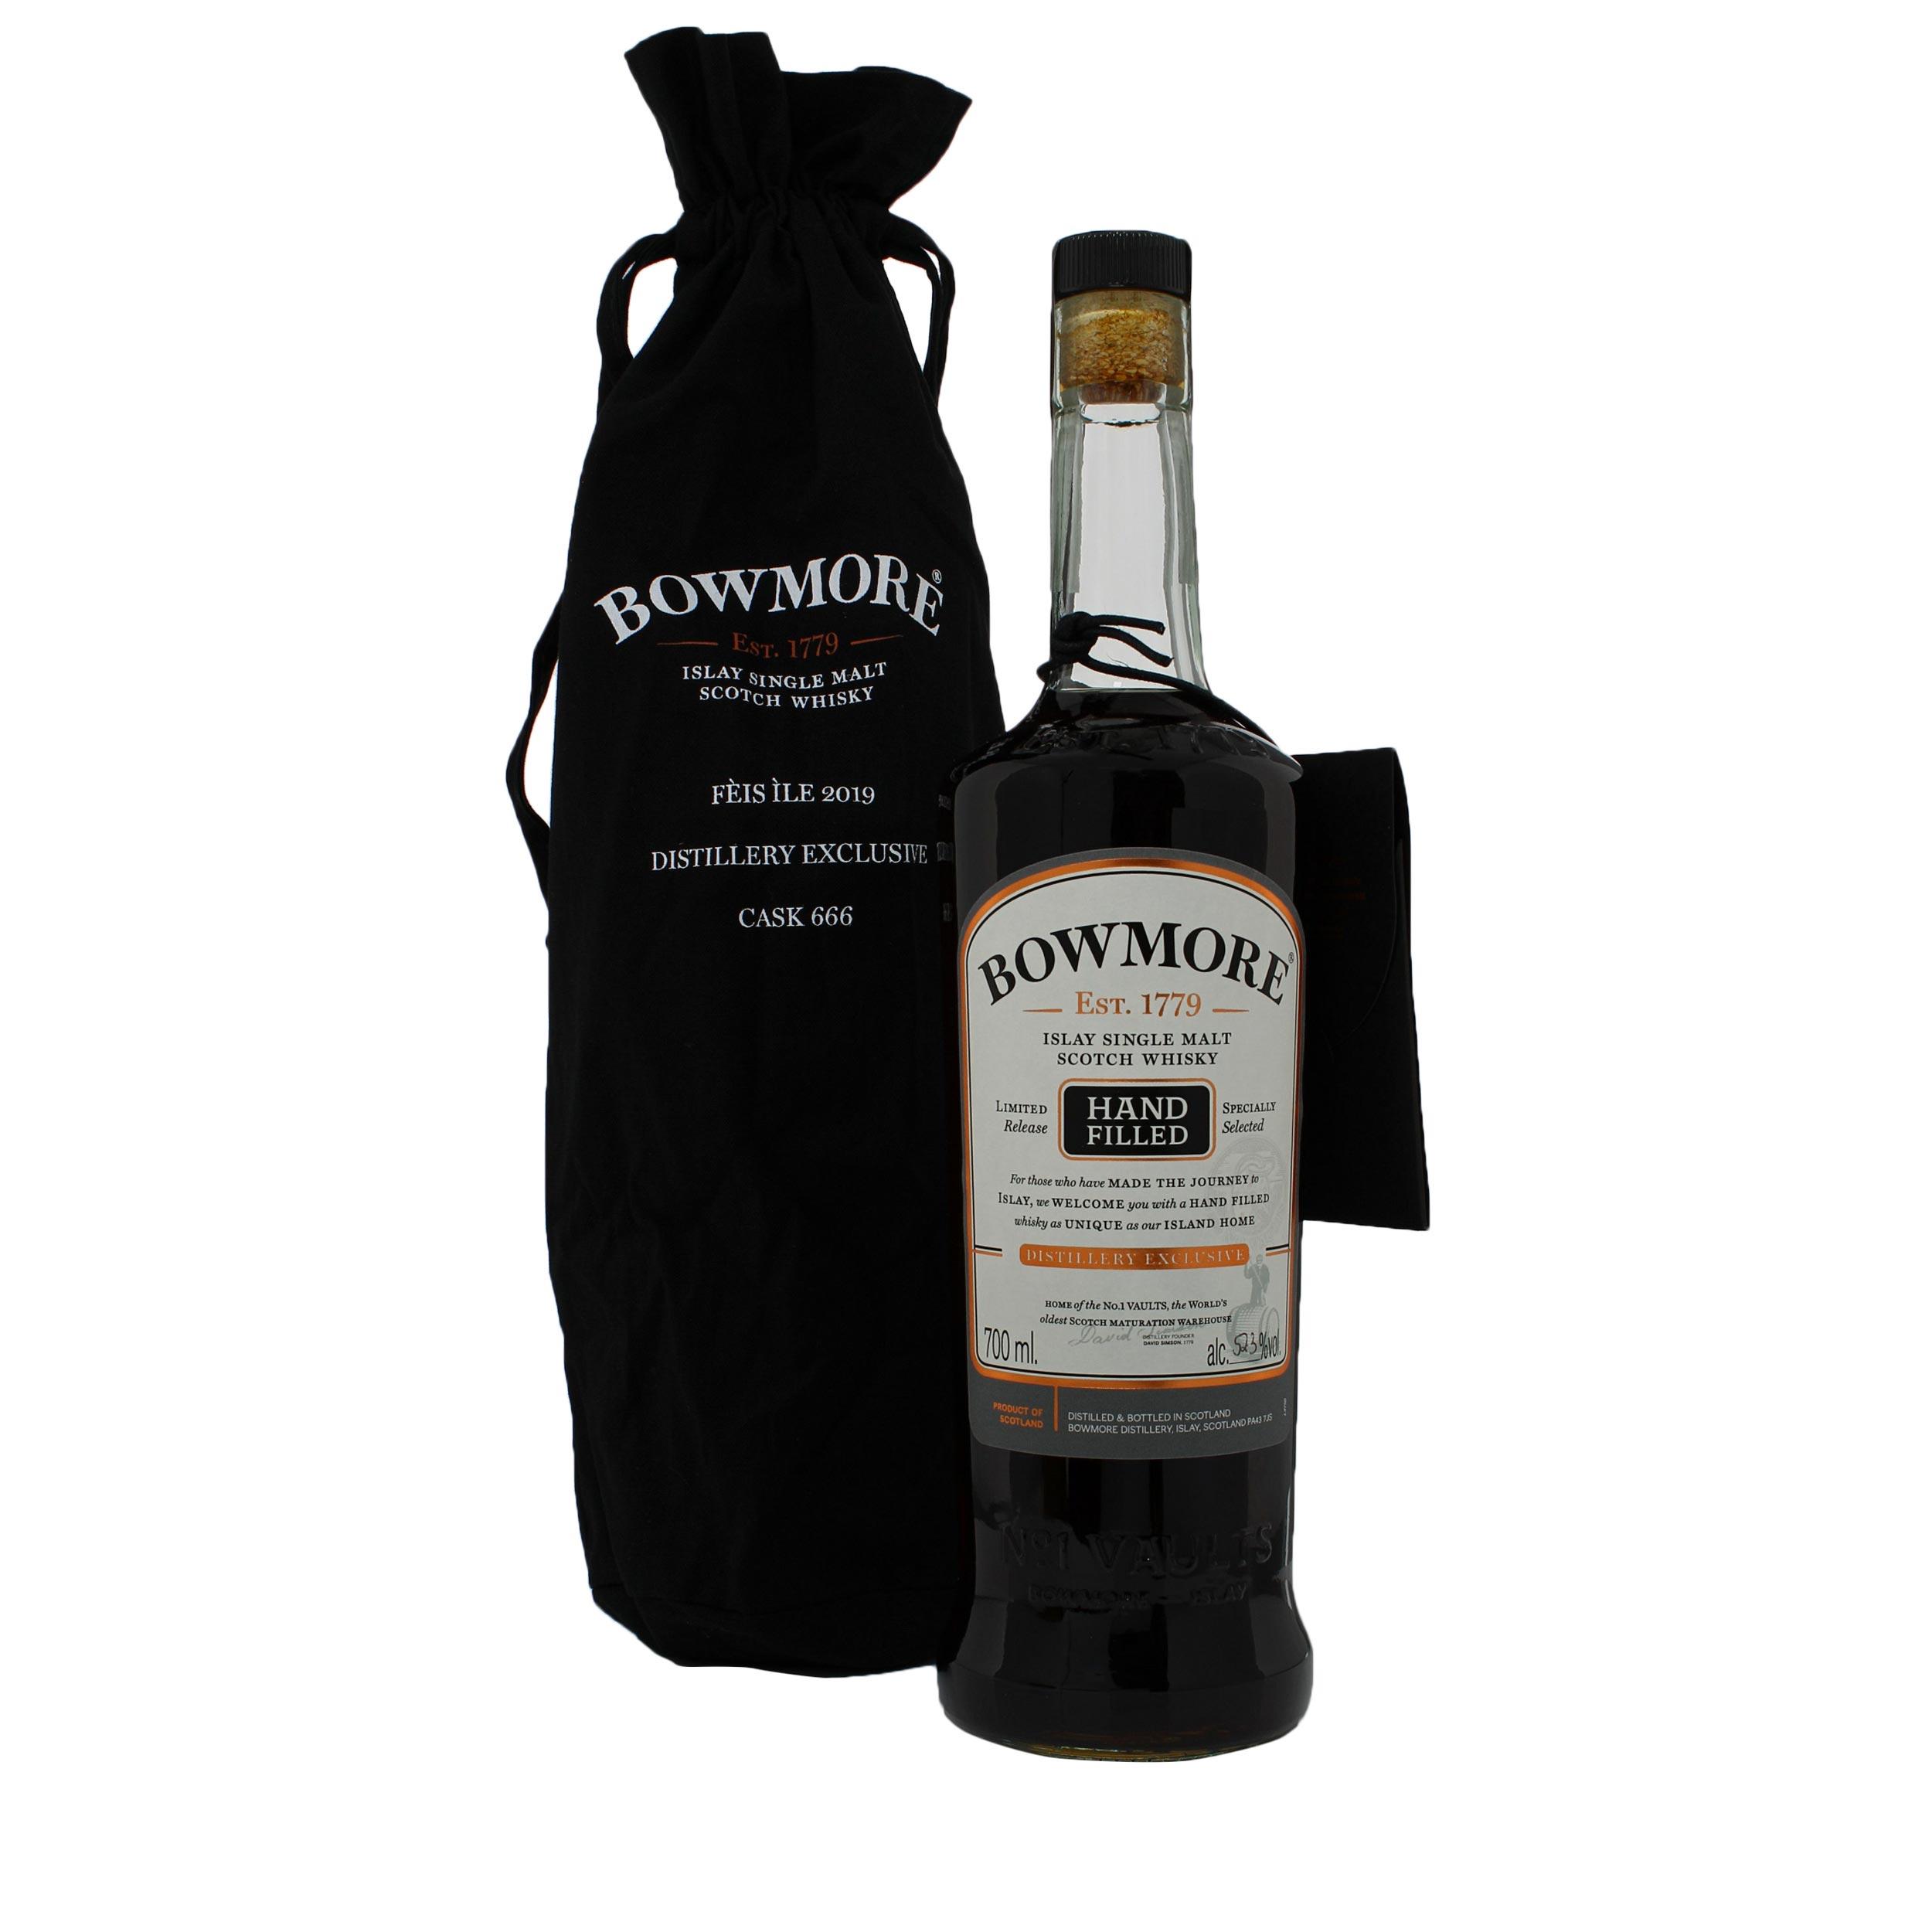 Bowmore Feis Ile 2019 Cask #666 Limited Edition Single Cask Islay Single Malt Scotch Whisky 70cl